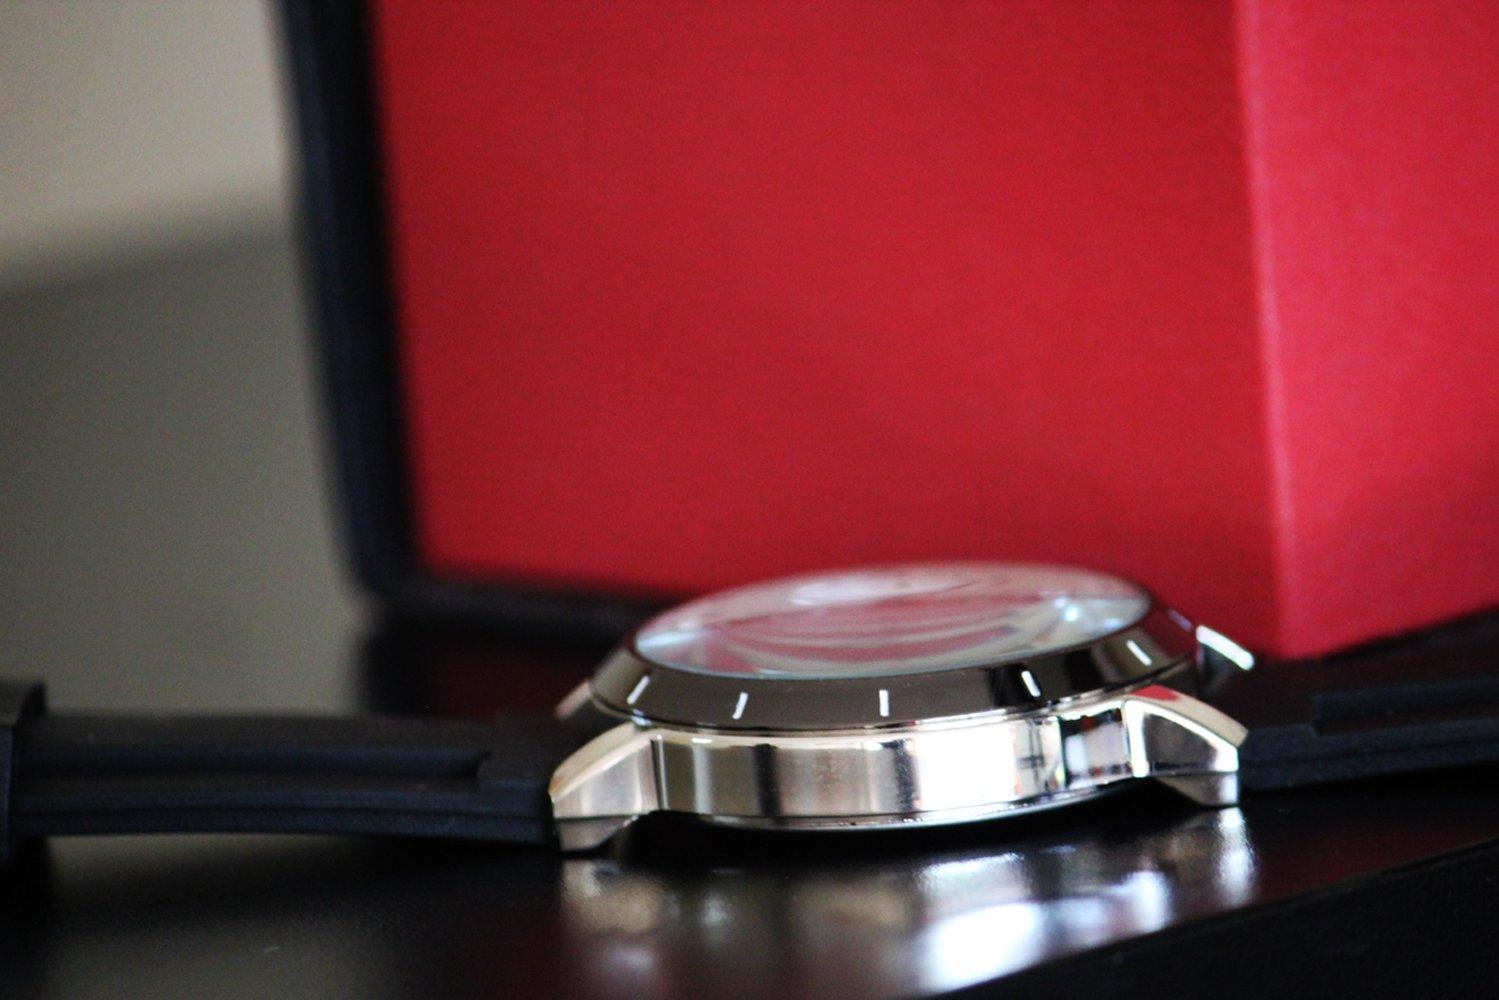 Hot New Custom Steering Honda Insight Concept Sport Wristwatch Sport Big Face Rubber Band